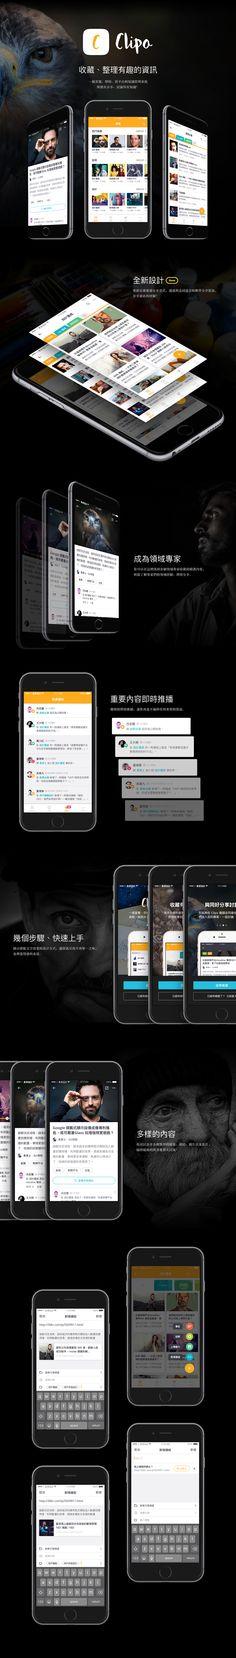 Clipo 收藏、整理有趣的資訊 | App 設計 on App Design Served Ios App, Iphone App, Ui Kit, Online Portfolio, Mobile Application, Behance, Web Design, Design Web, Website Designs